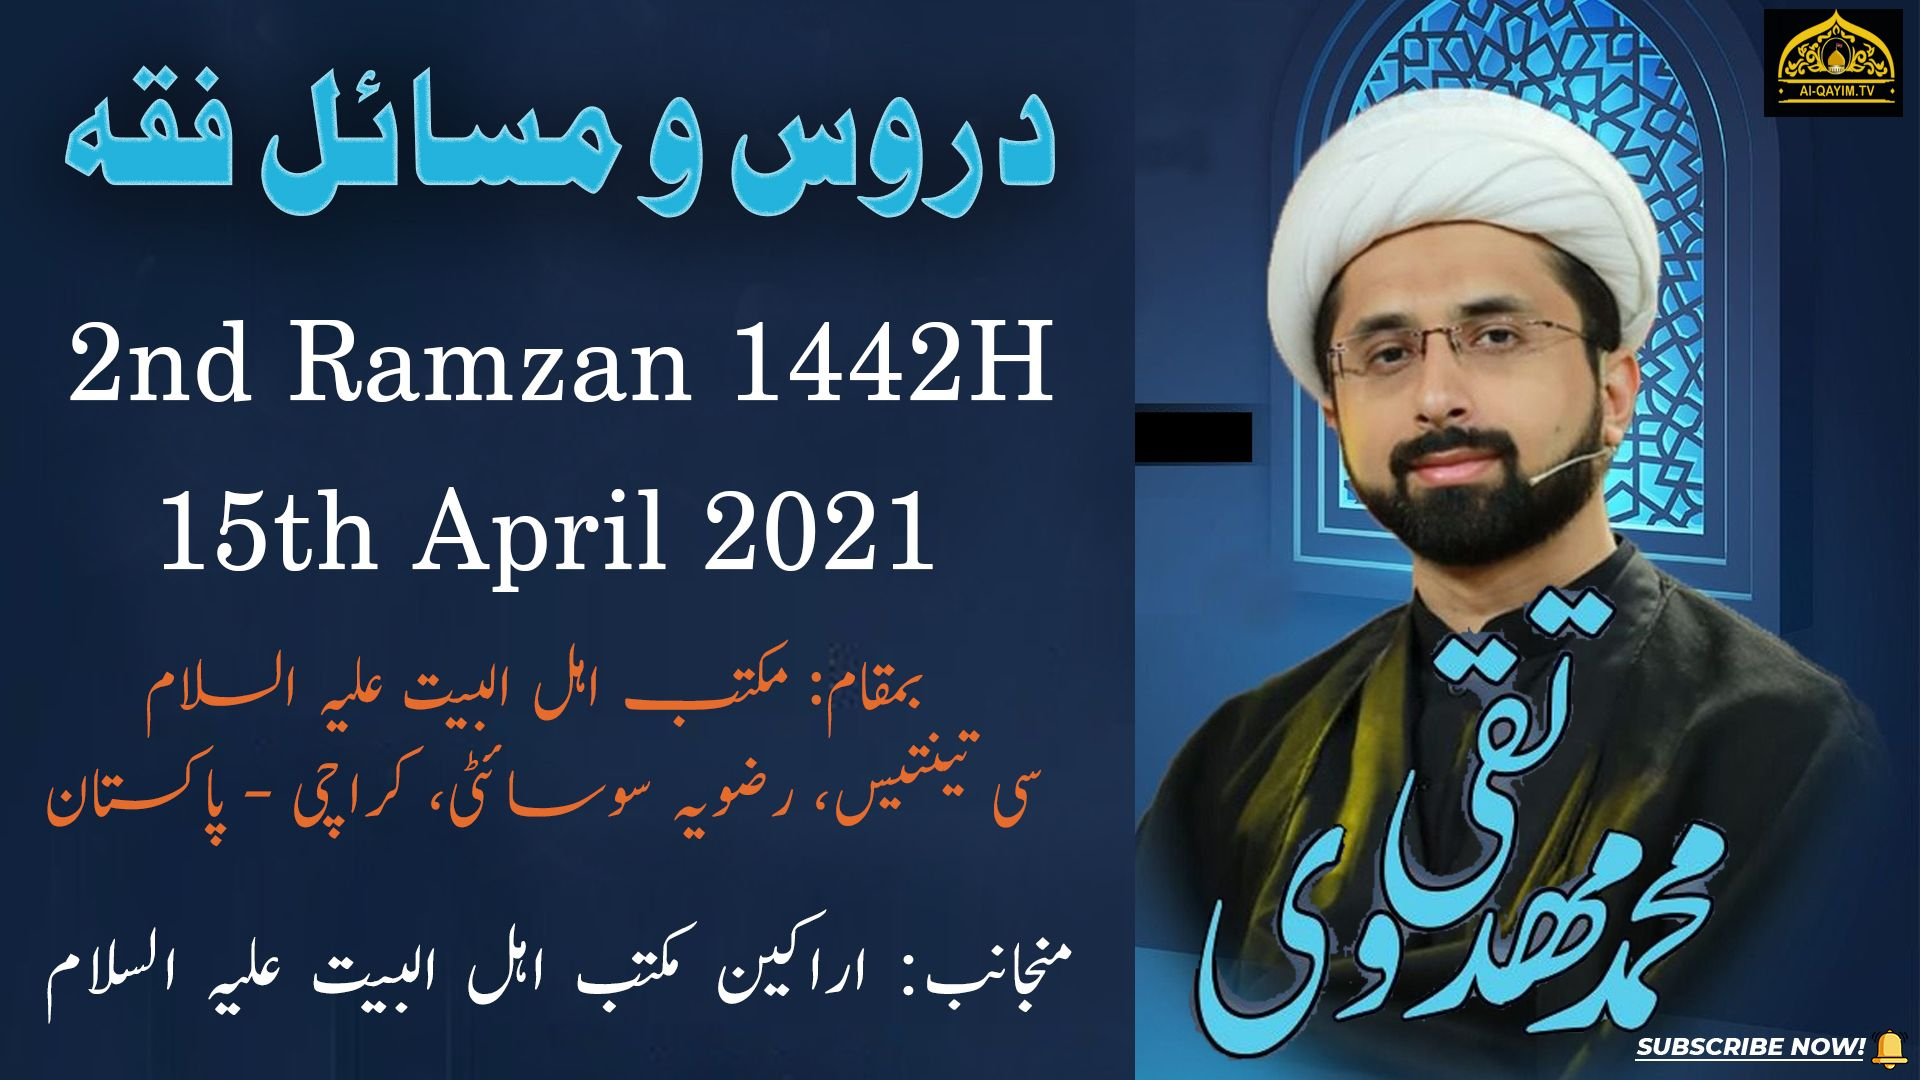 Moulana Muhammad Taqi Mehdavi | Dars Wo Masail Fiqae | 2nd Ramzan 2021 | Maktab-e-Ahlebait - Karachi